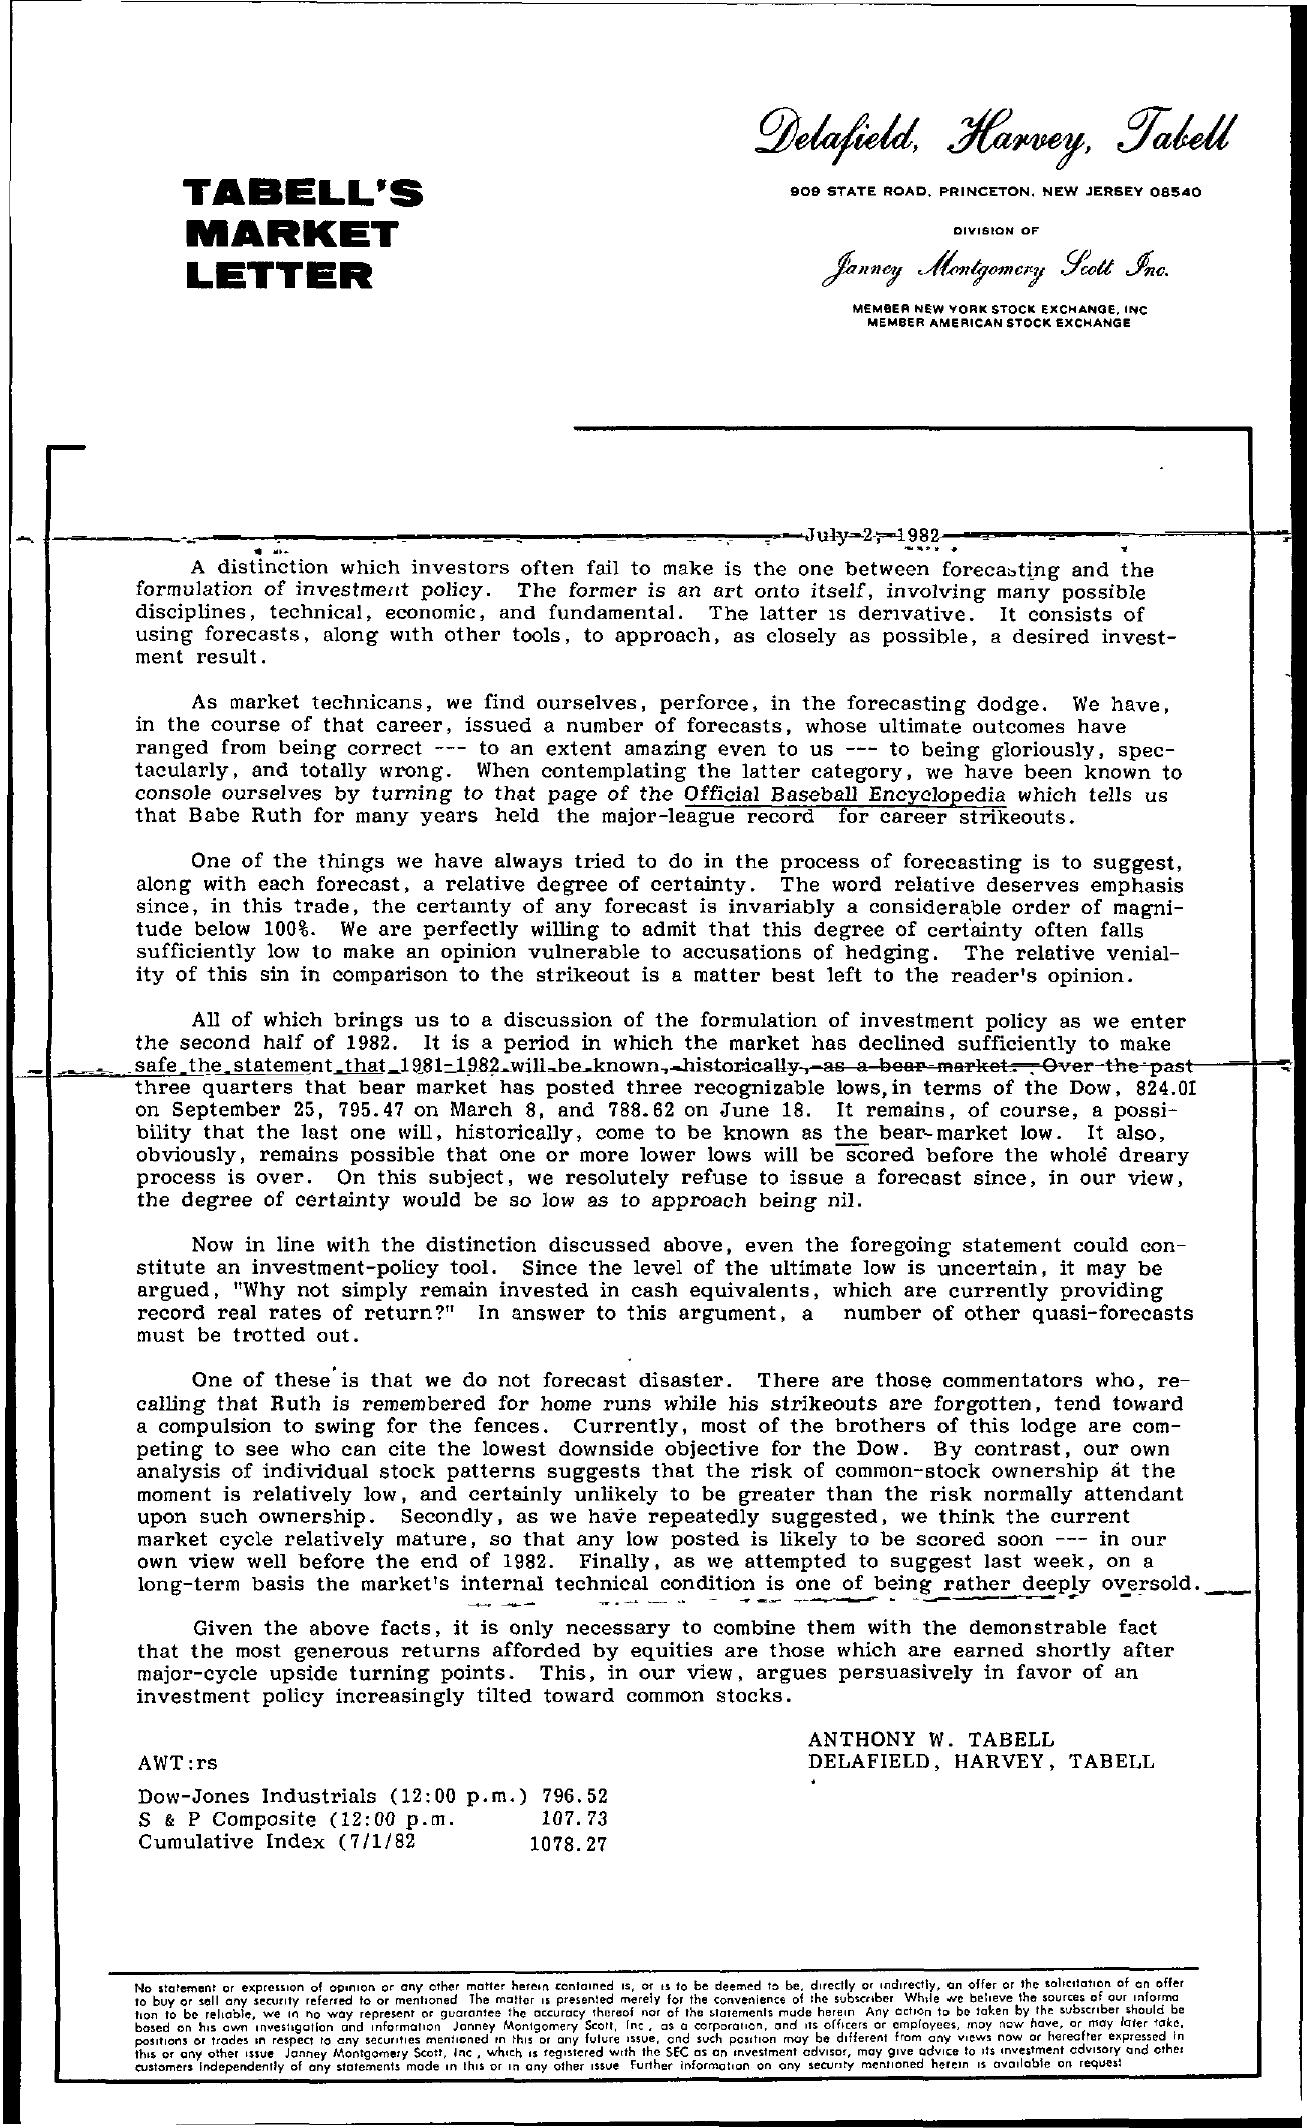 Tabell's Market Letter - July 02, 1982